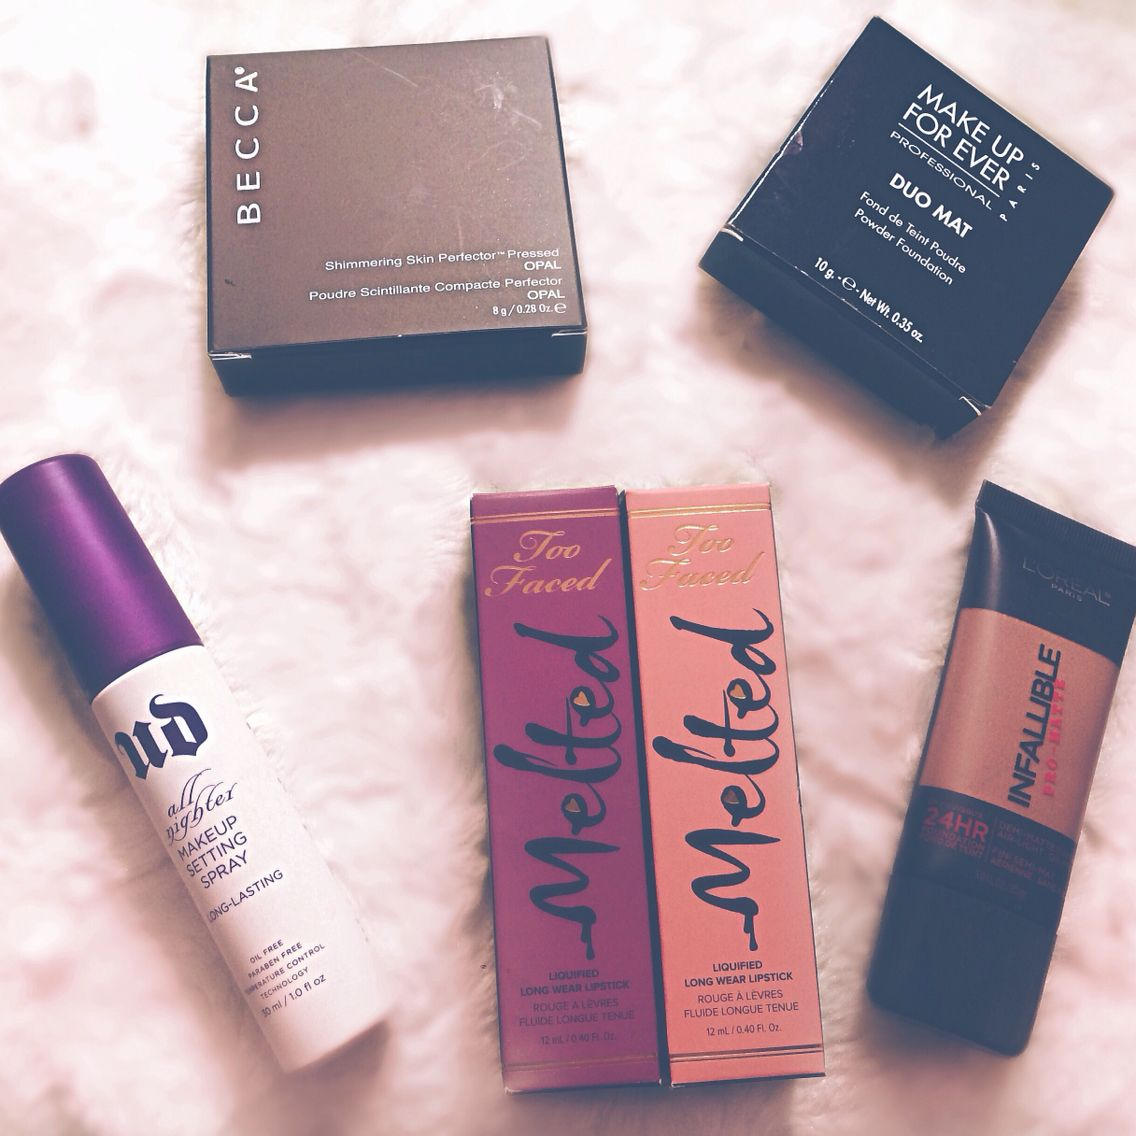 Sephora Mini Haul Mini makeup shopping from Sephora and